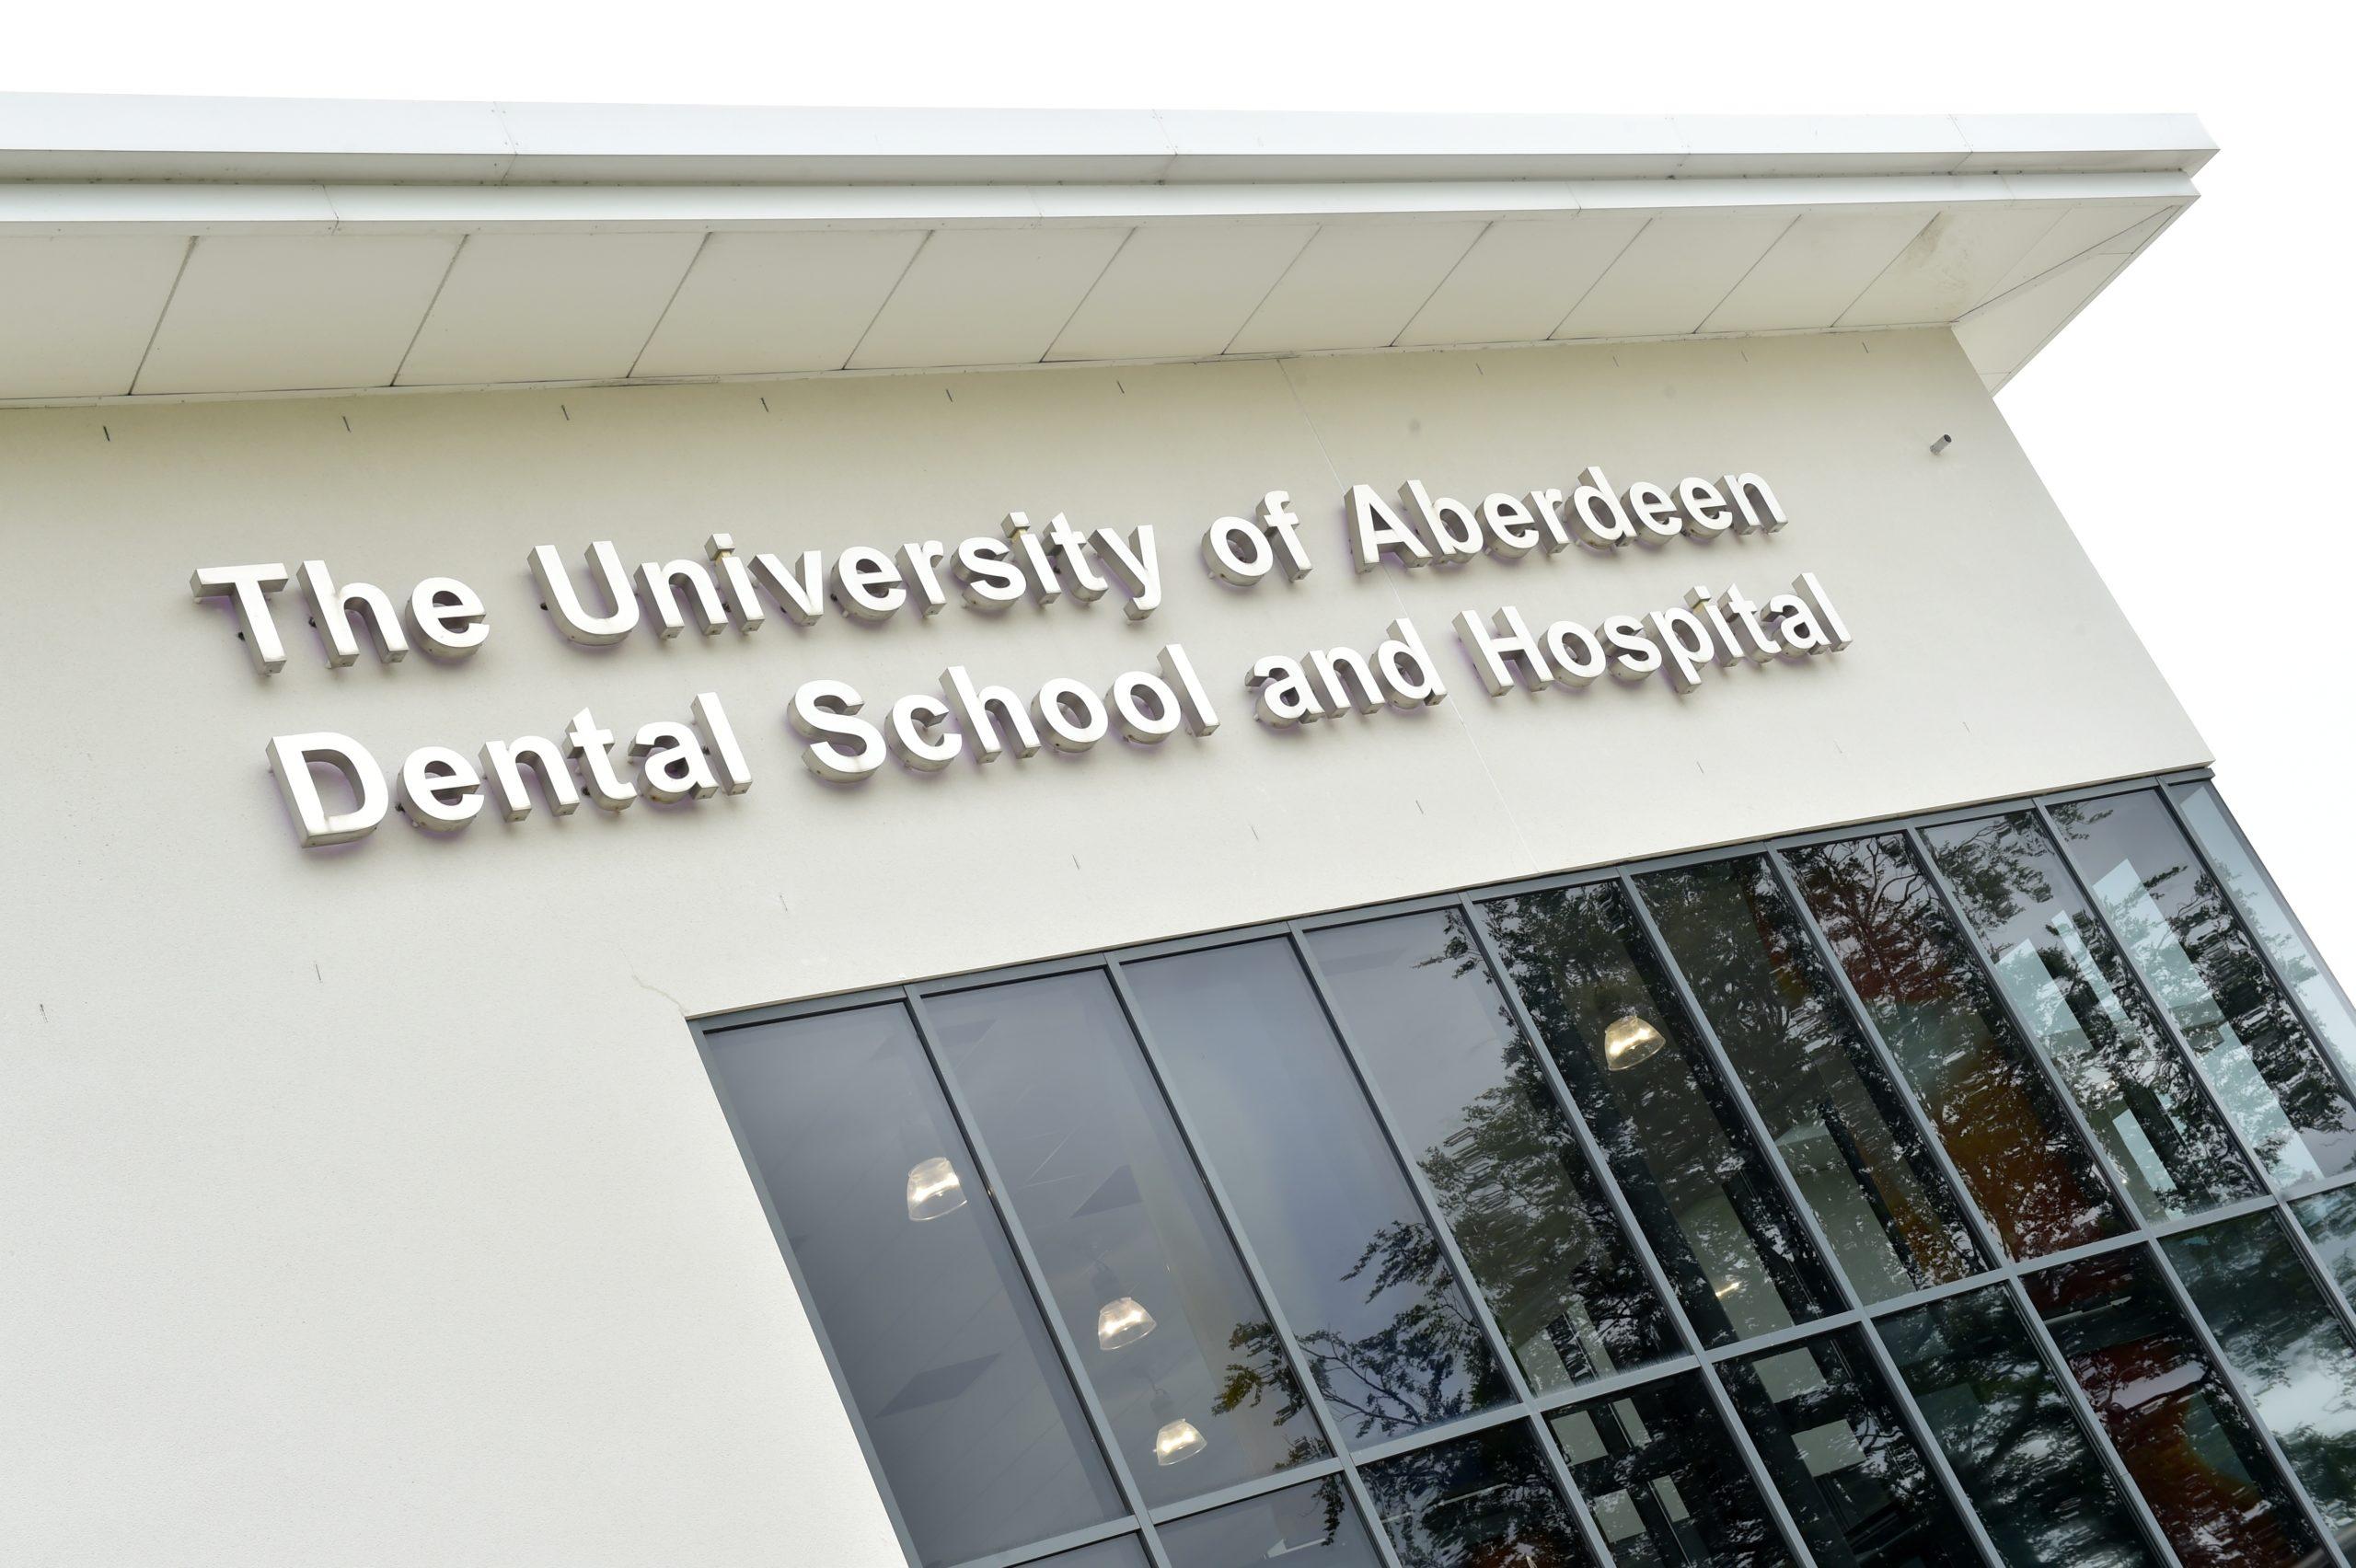 Aberdeen University's Medicine programme has improved on its ranking